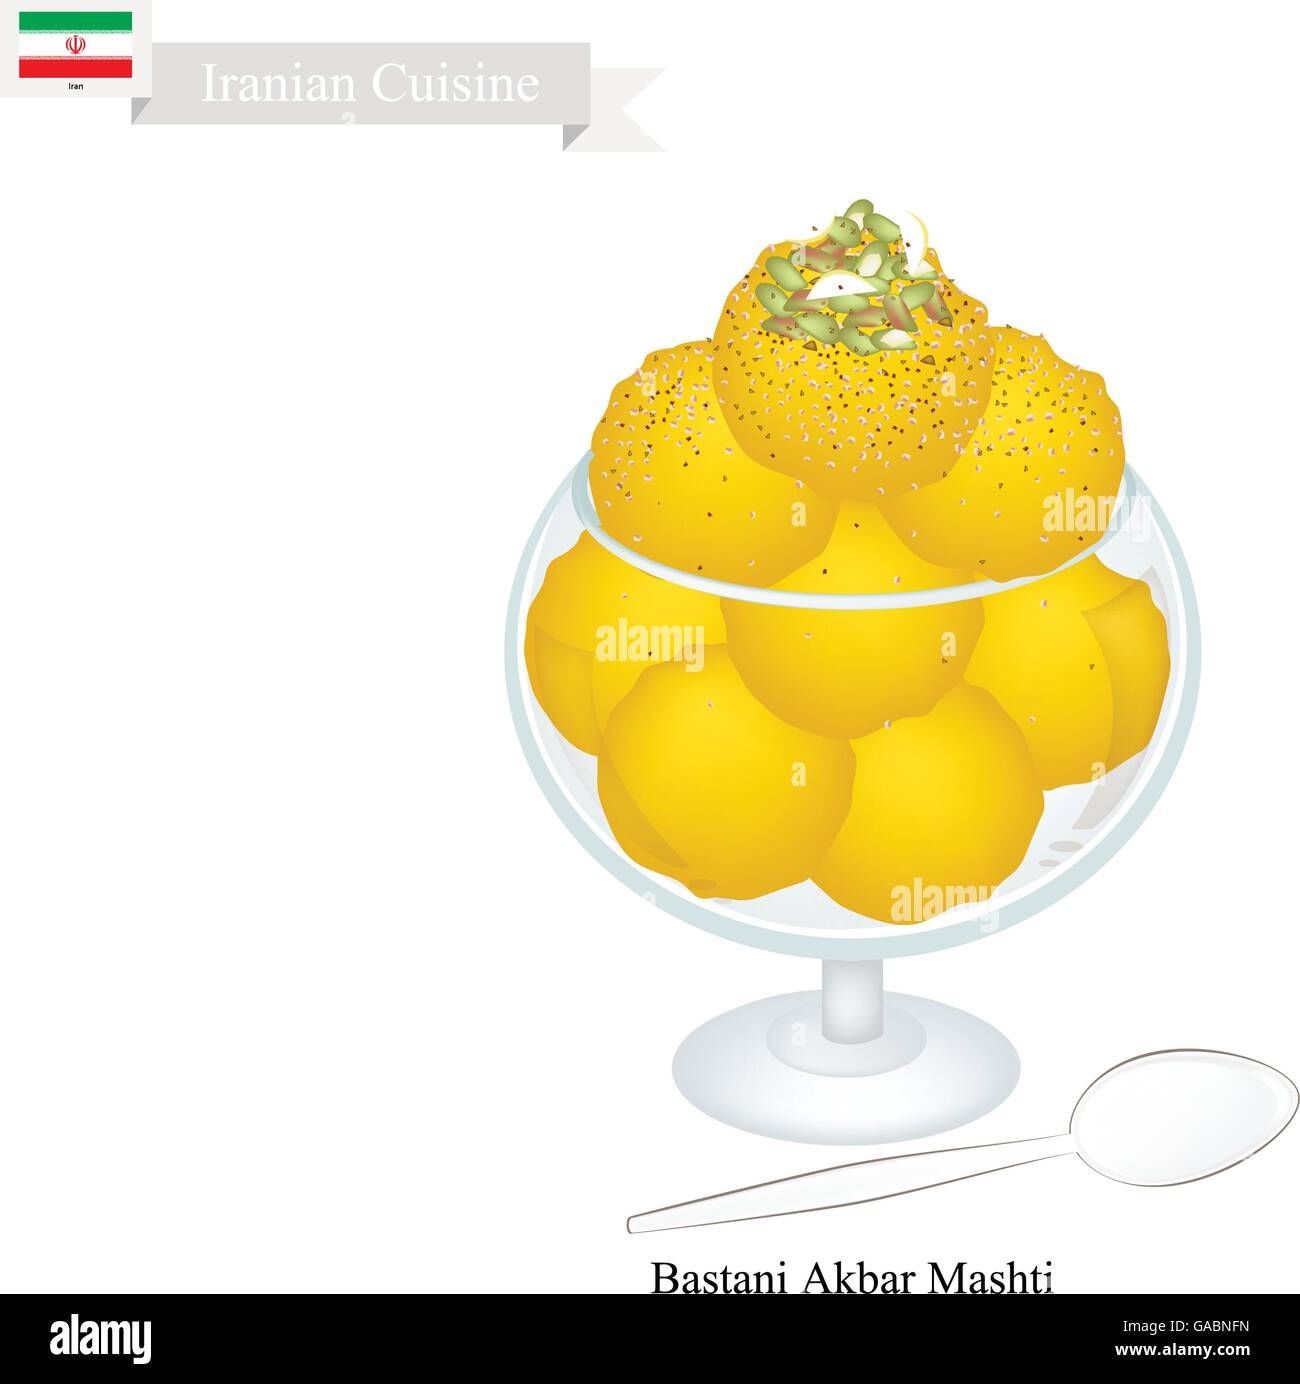 Iranian Cuisine, Bastani Akbar Mashti or Traditional Persian Ice Cream Made From Milk, Eggs, Sugar, Rose Water and Stock Vector